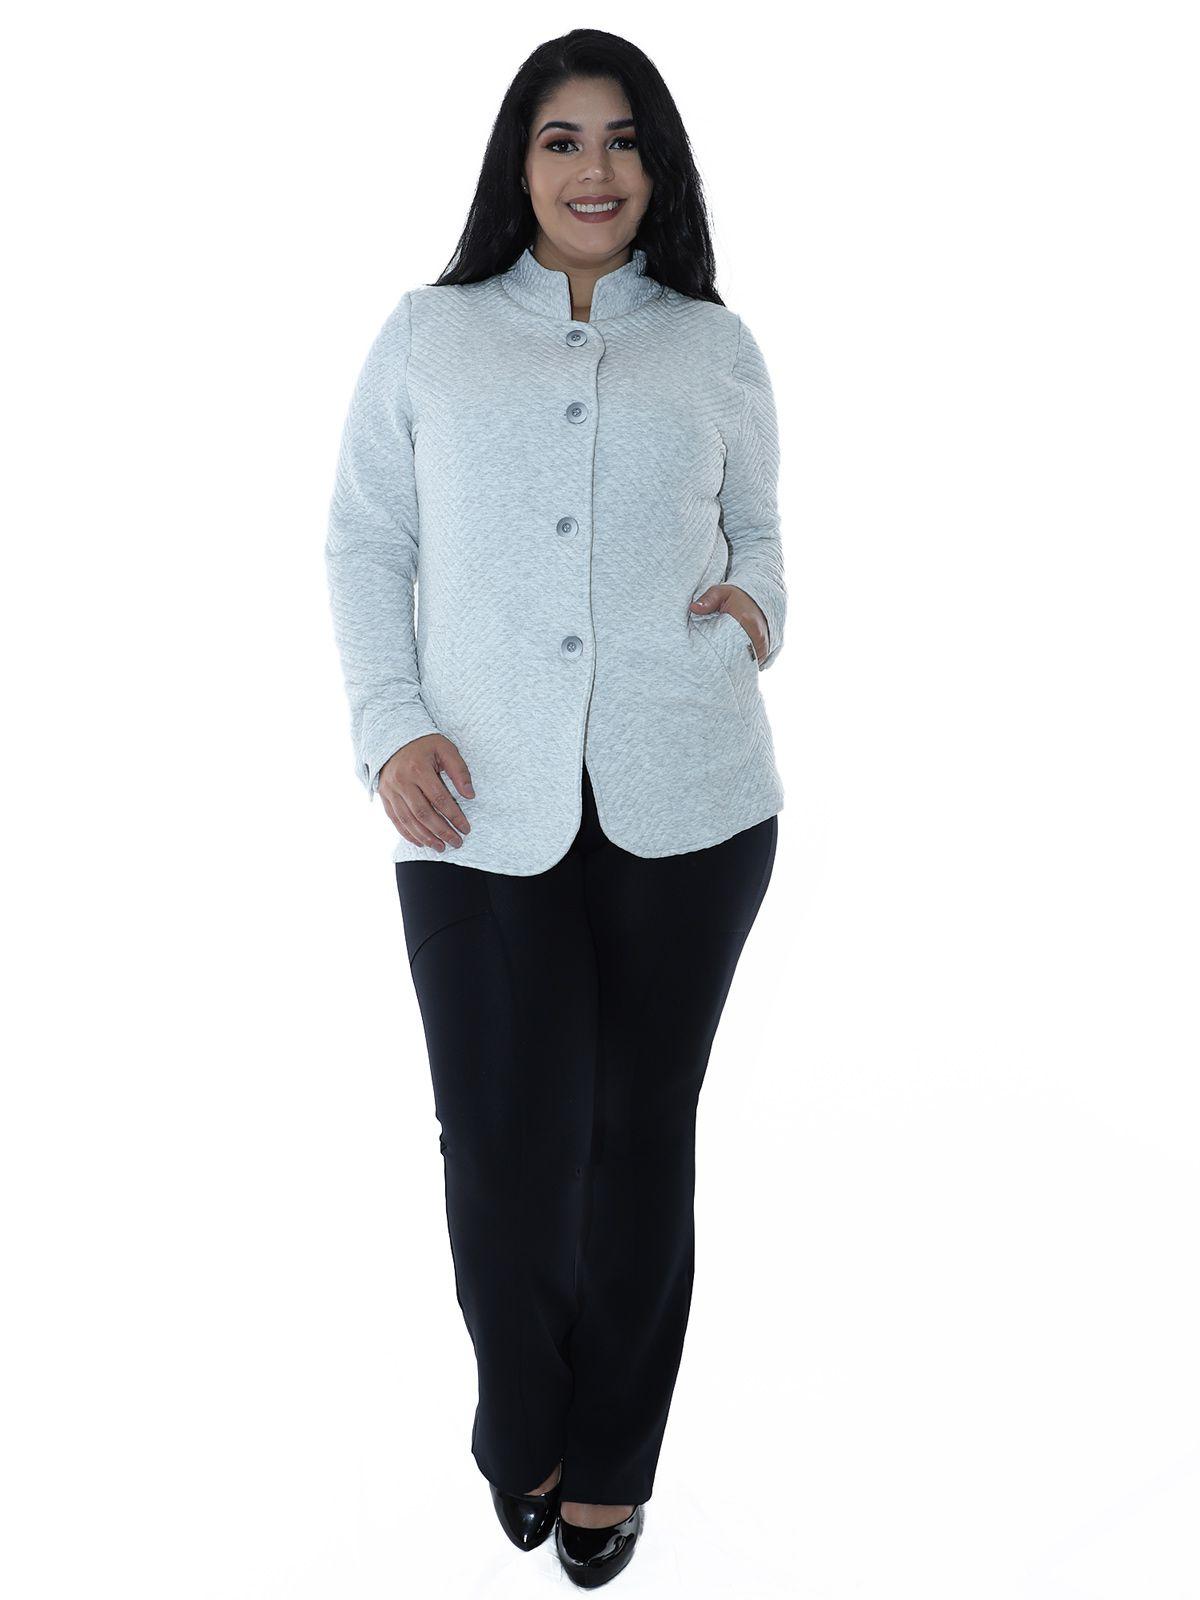 Casaco Plus Size Matelasse com Botões Branco